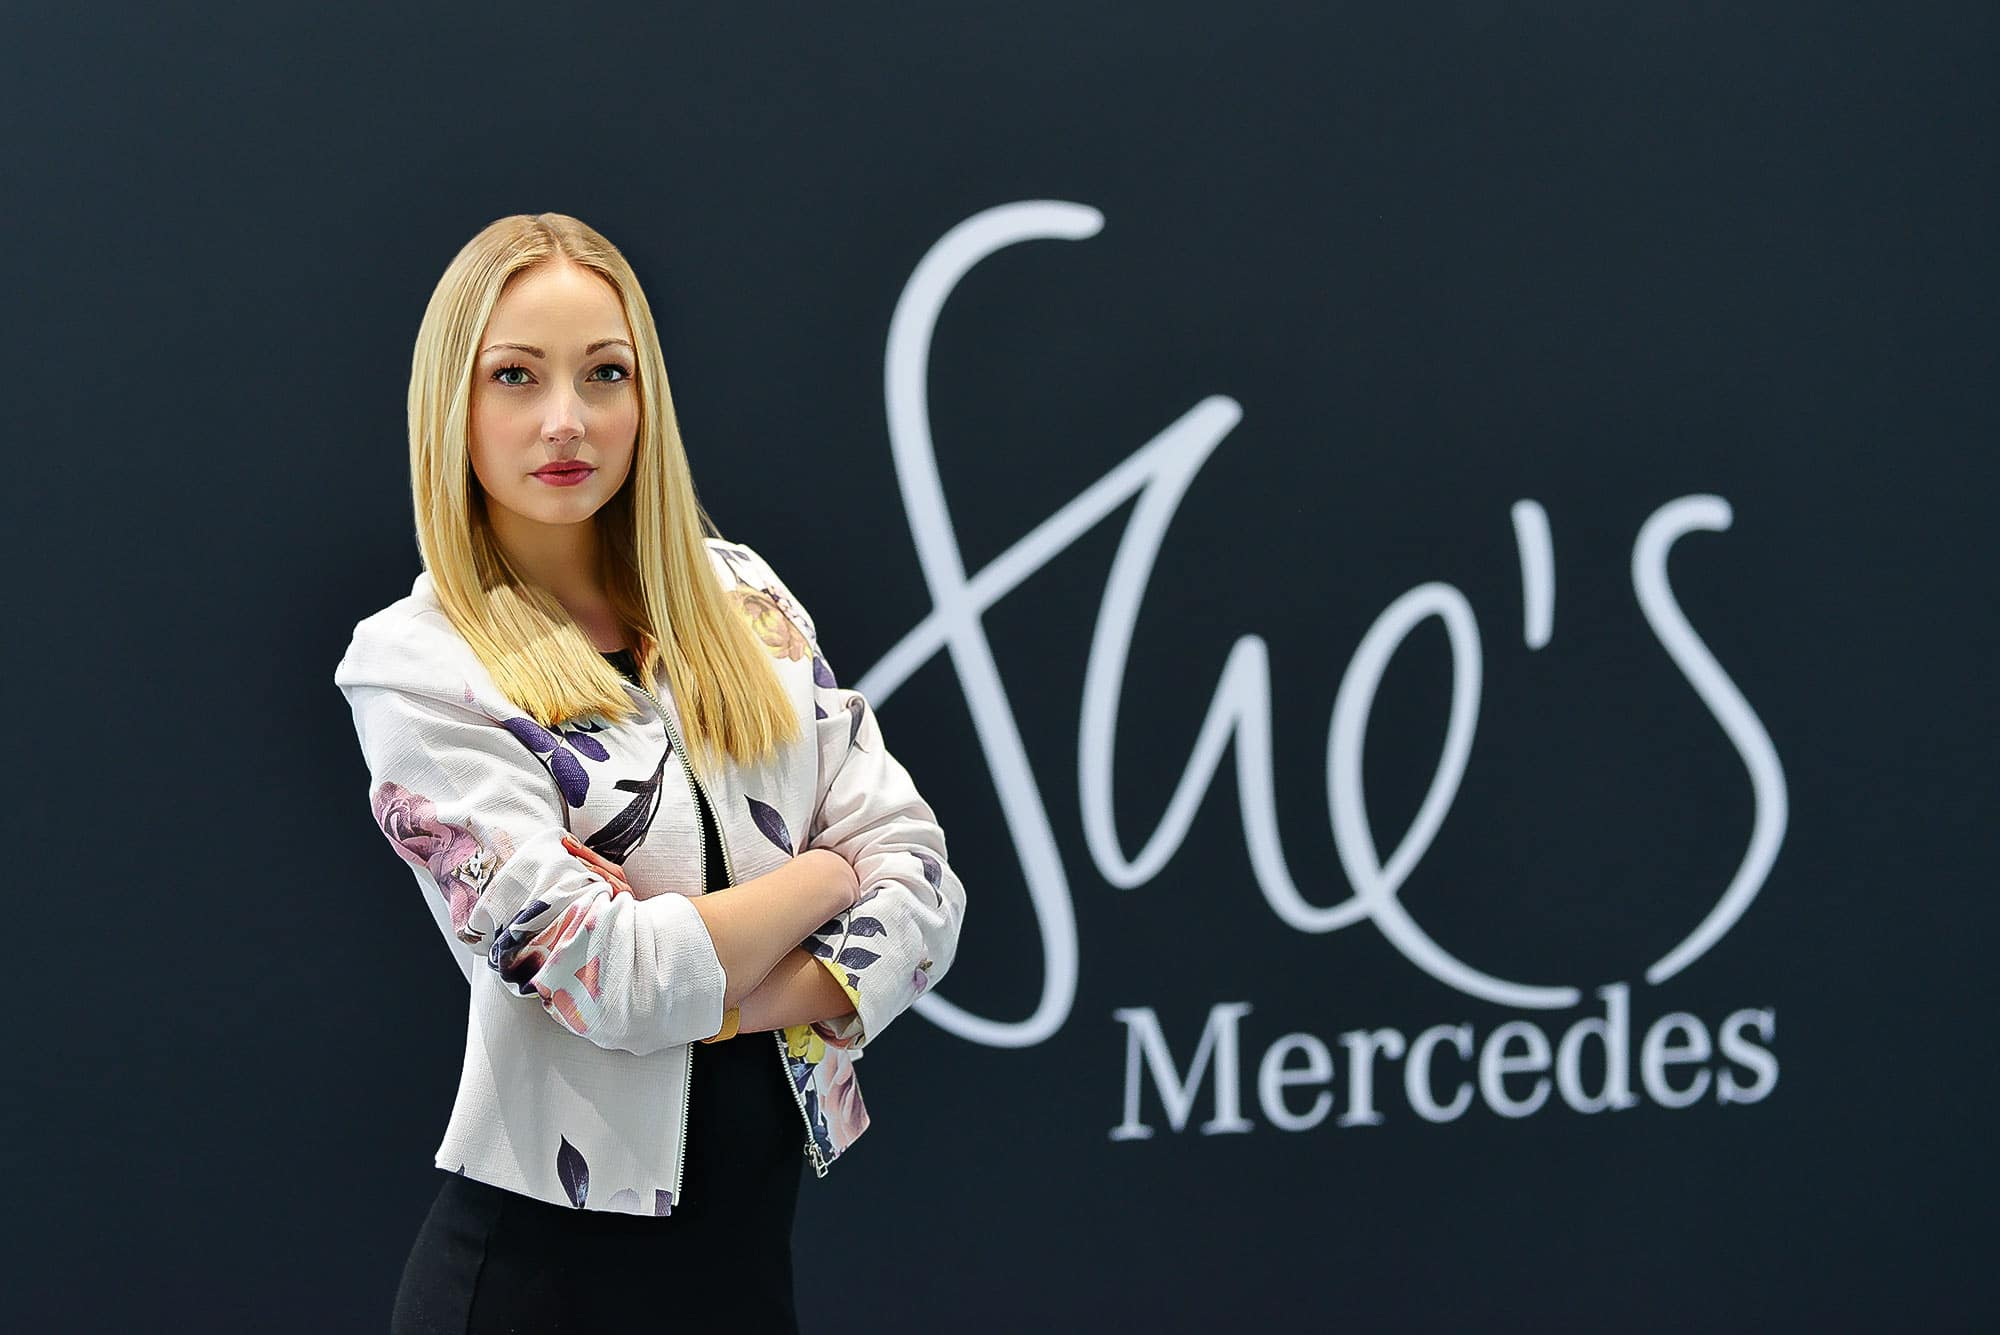 Fotograf Fashion Mercedes Benz Shes lifestyleshooting n%C3%BCrnberg niederlassung editorial fotostudio Portrait erlangen max hoerath design f%C3%BCrth - Lifestyle Fotoshooting mit Kira für She´s Mercedes